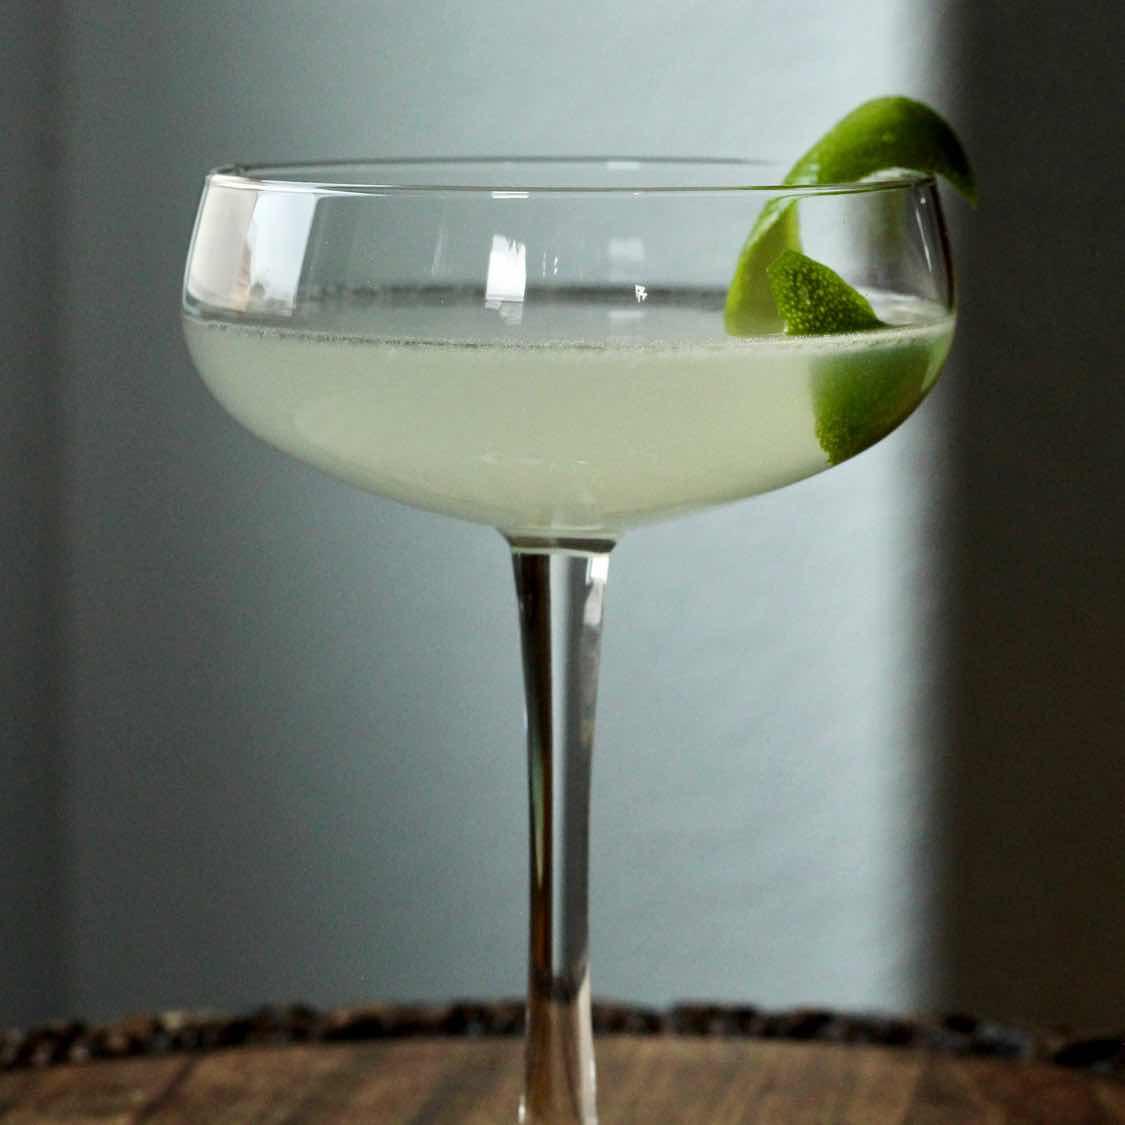 Daiquiri - The Classic Late 1800s Jennings Cox, Cuban Cocktail